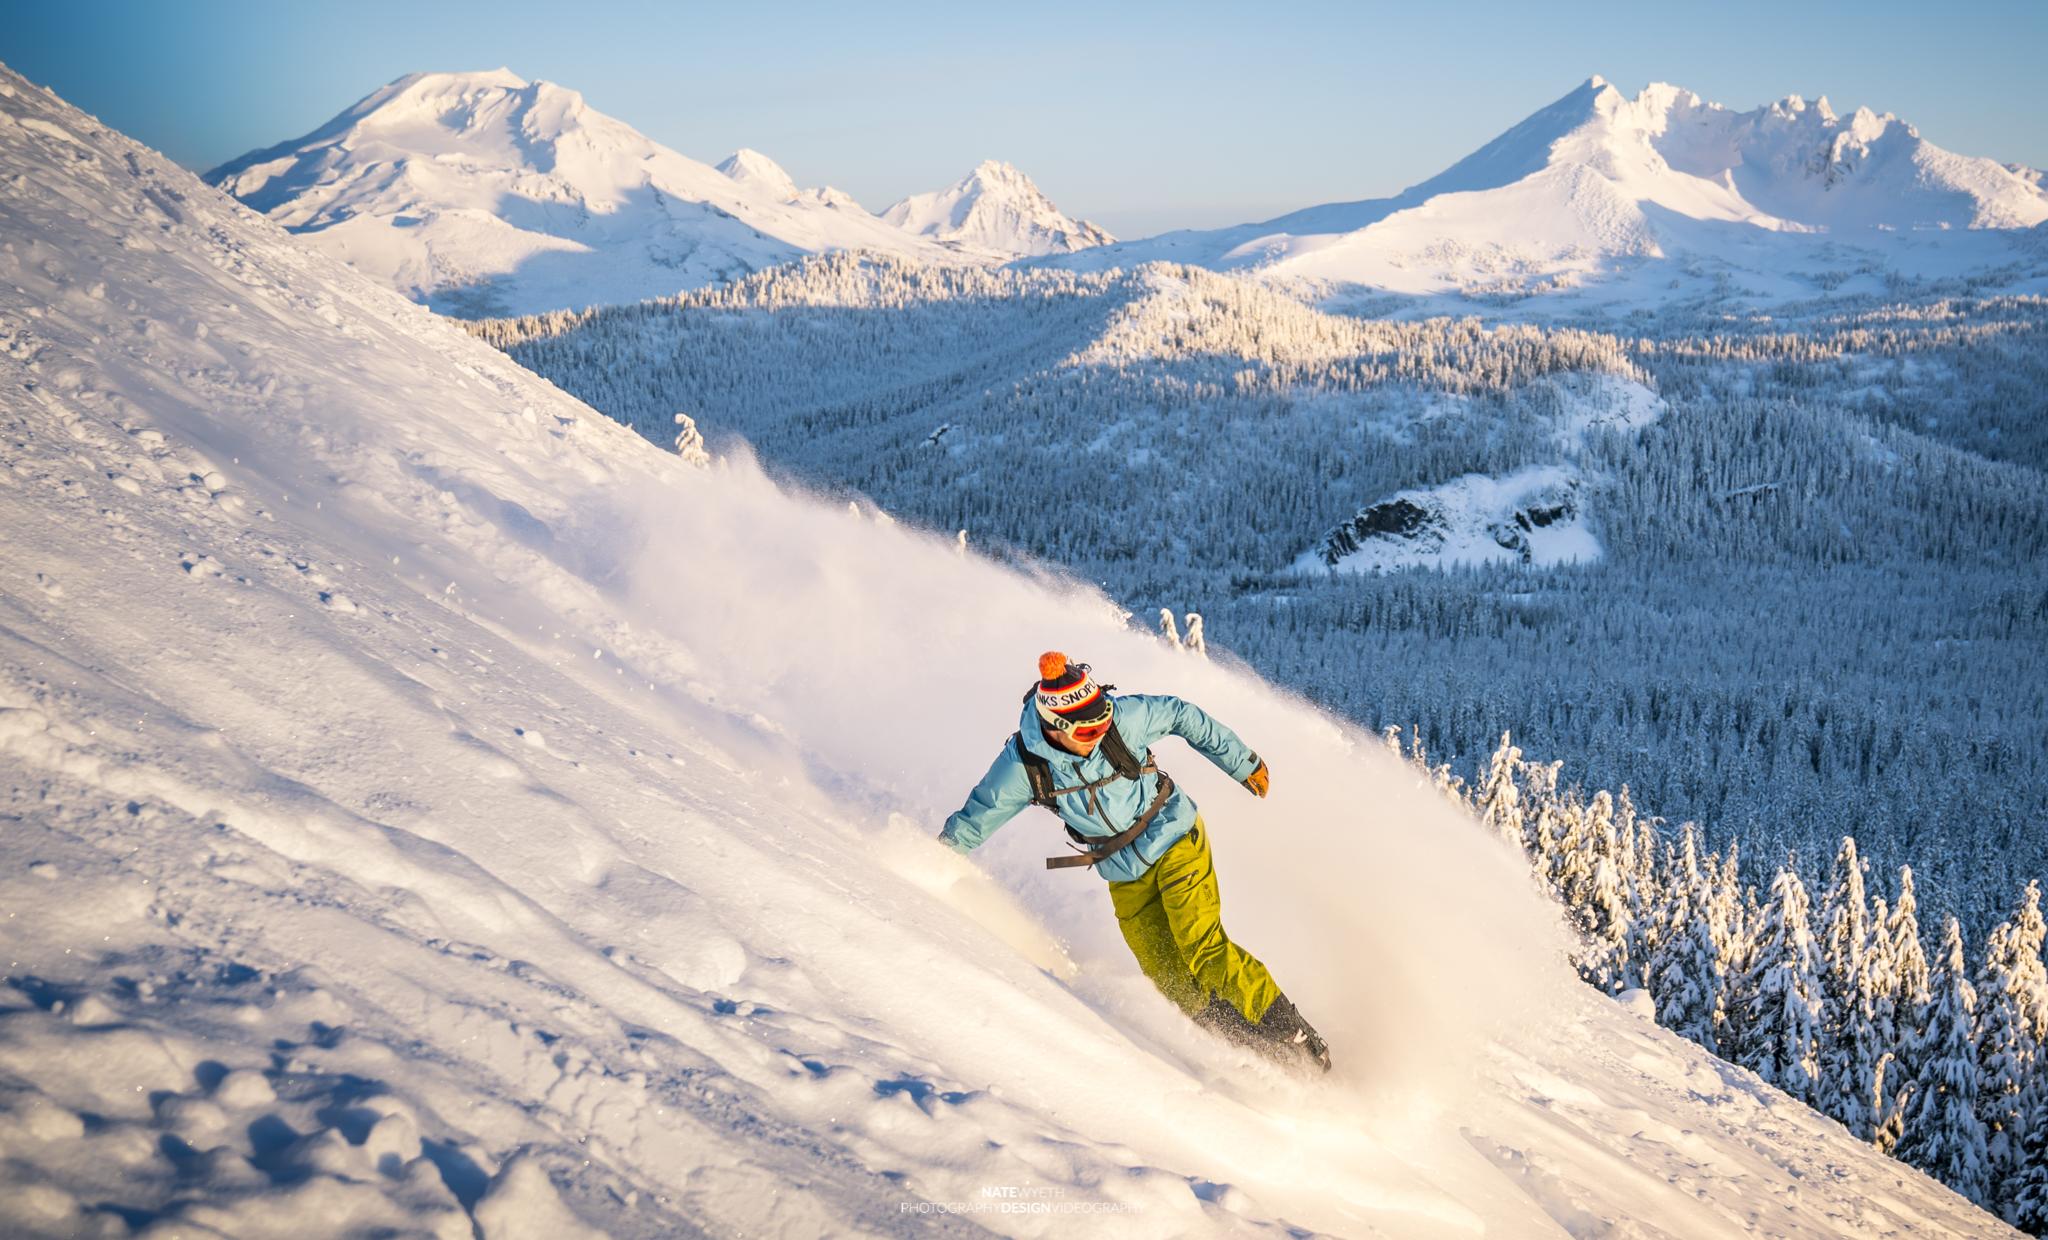 Snowboarding at Mt. Bachelor in Bend, Oregon.